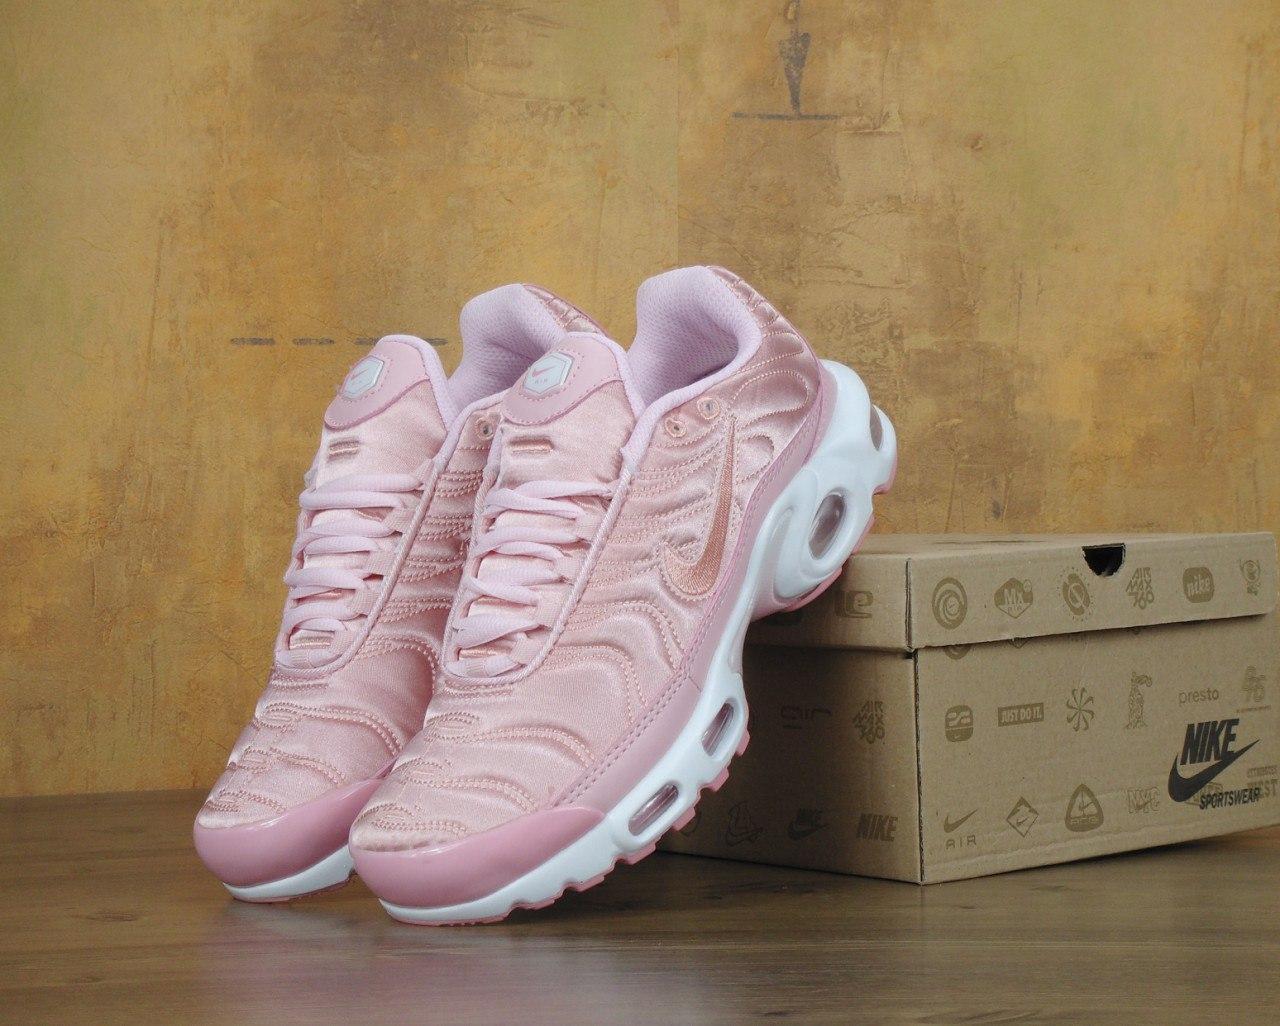 64a30b920d7446 Кроссовки Nike Air Max Tn+ 1 Satin Pack Pink. Топ качество! Живое фото  (Реплика ААА+)